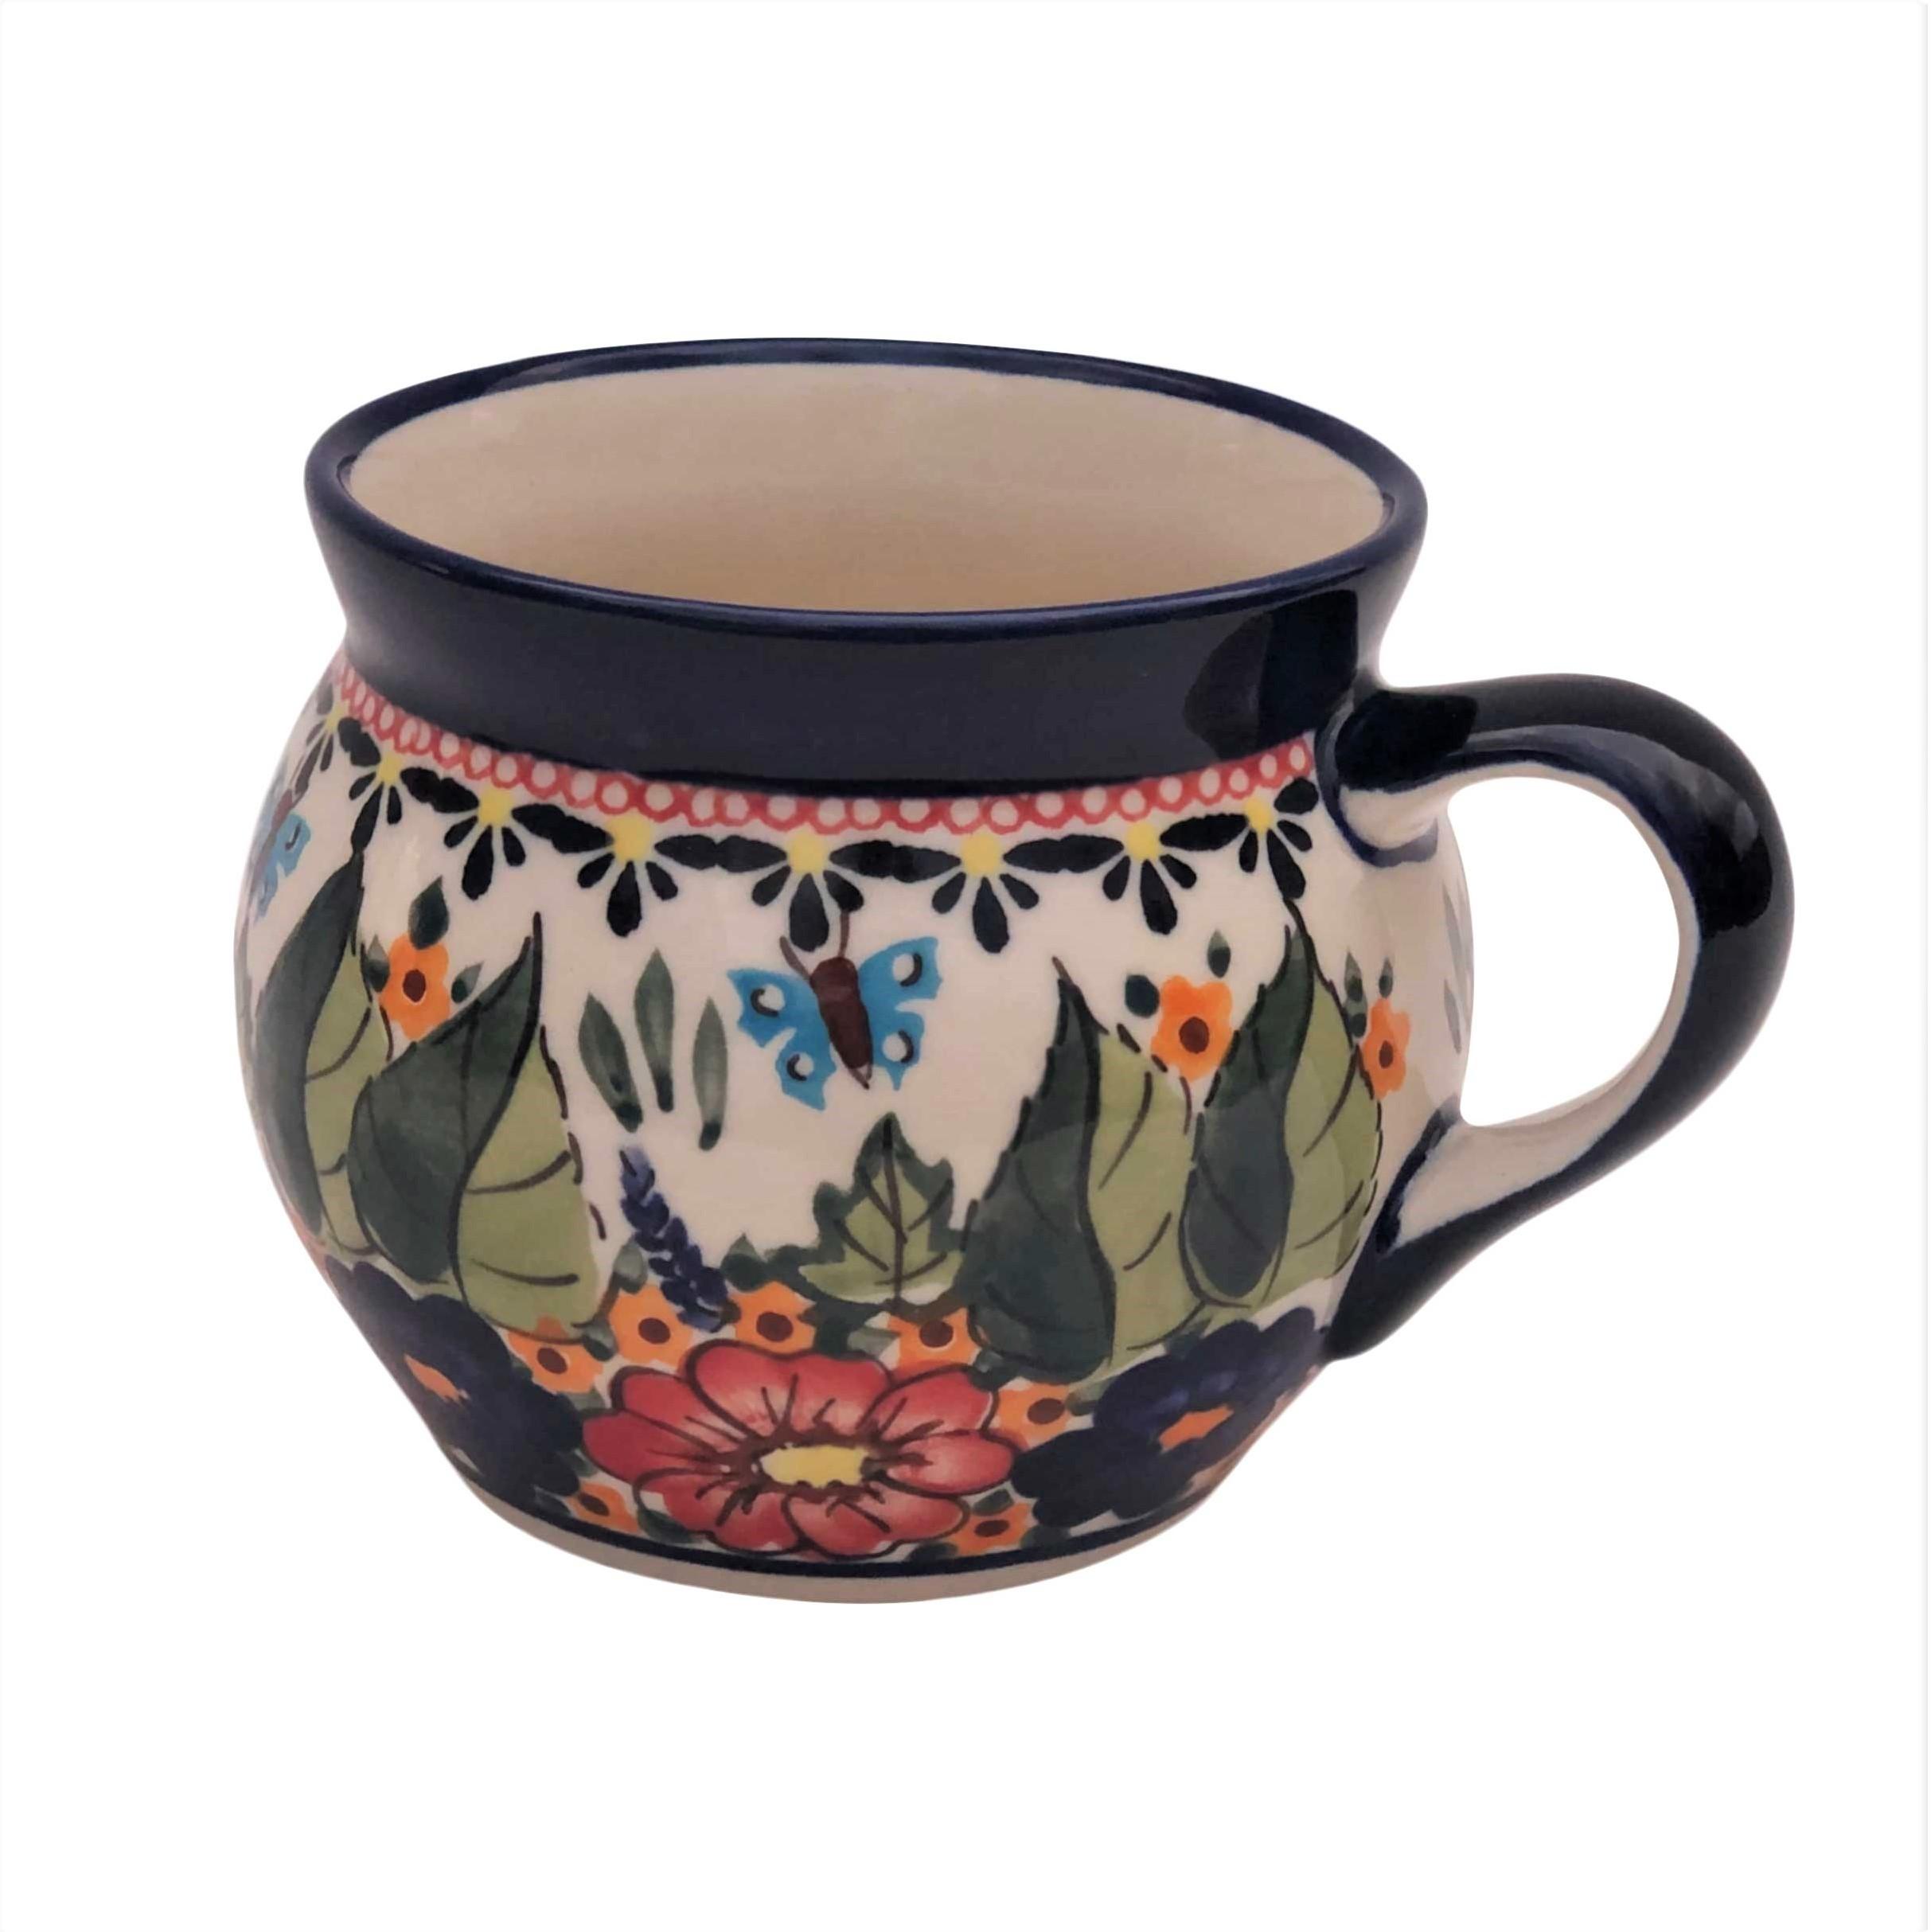 Pottery Avenue Butterfly Merry Making 16oz Bubble Mug